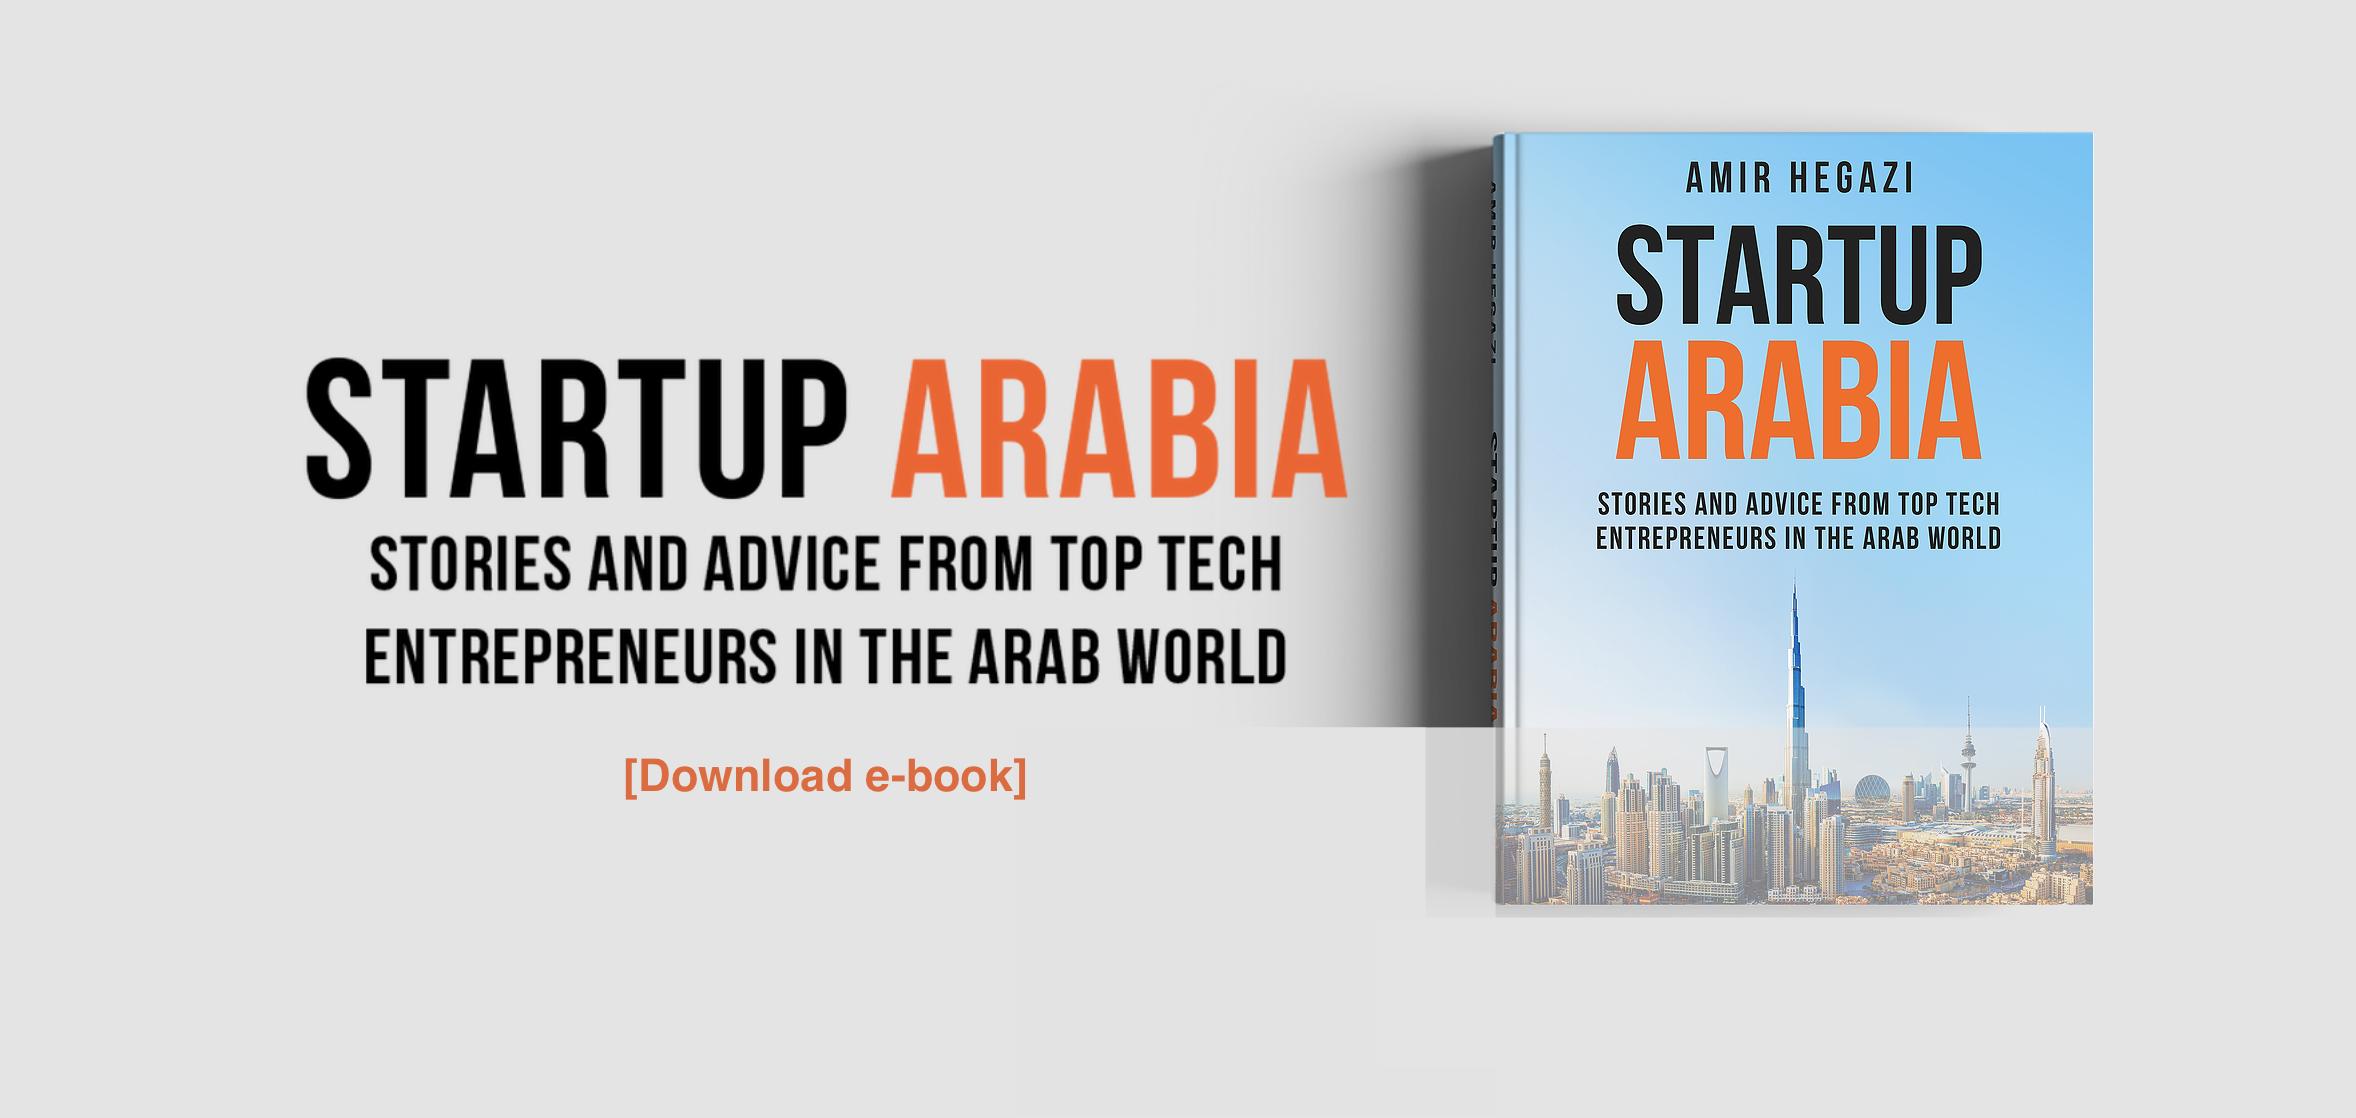 Startup Arabia: the untold stories of high-tech Mena entrepreneurs - كتاب ستارت أب عربية  [Free download - حمل الكتاب مجاناً]